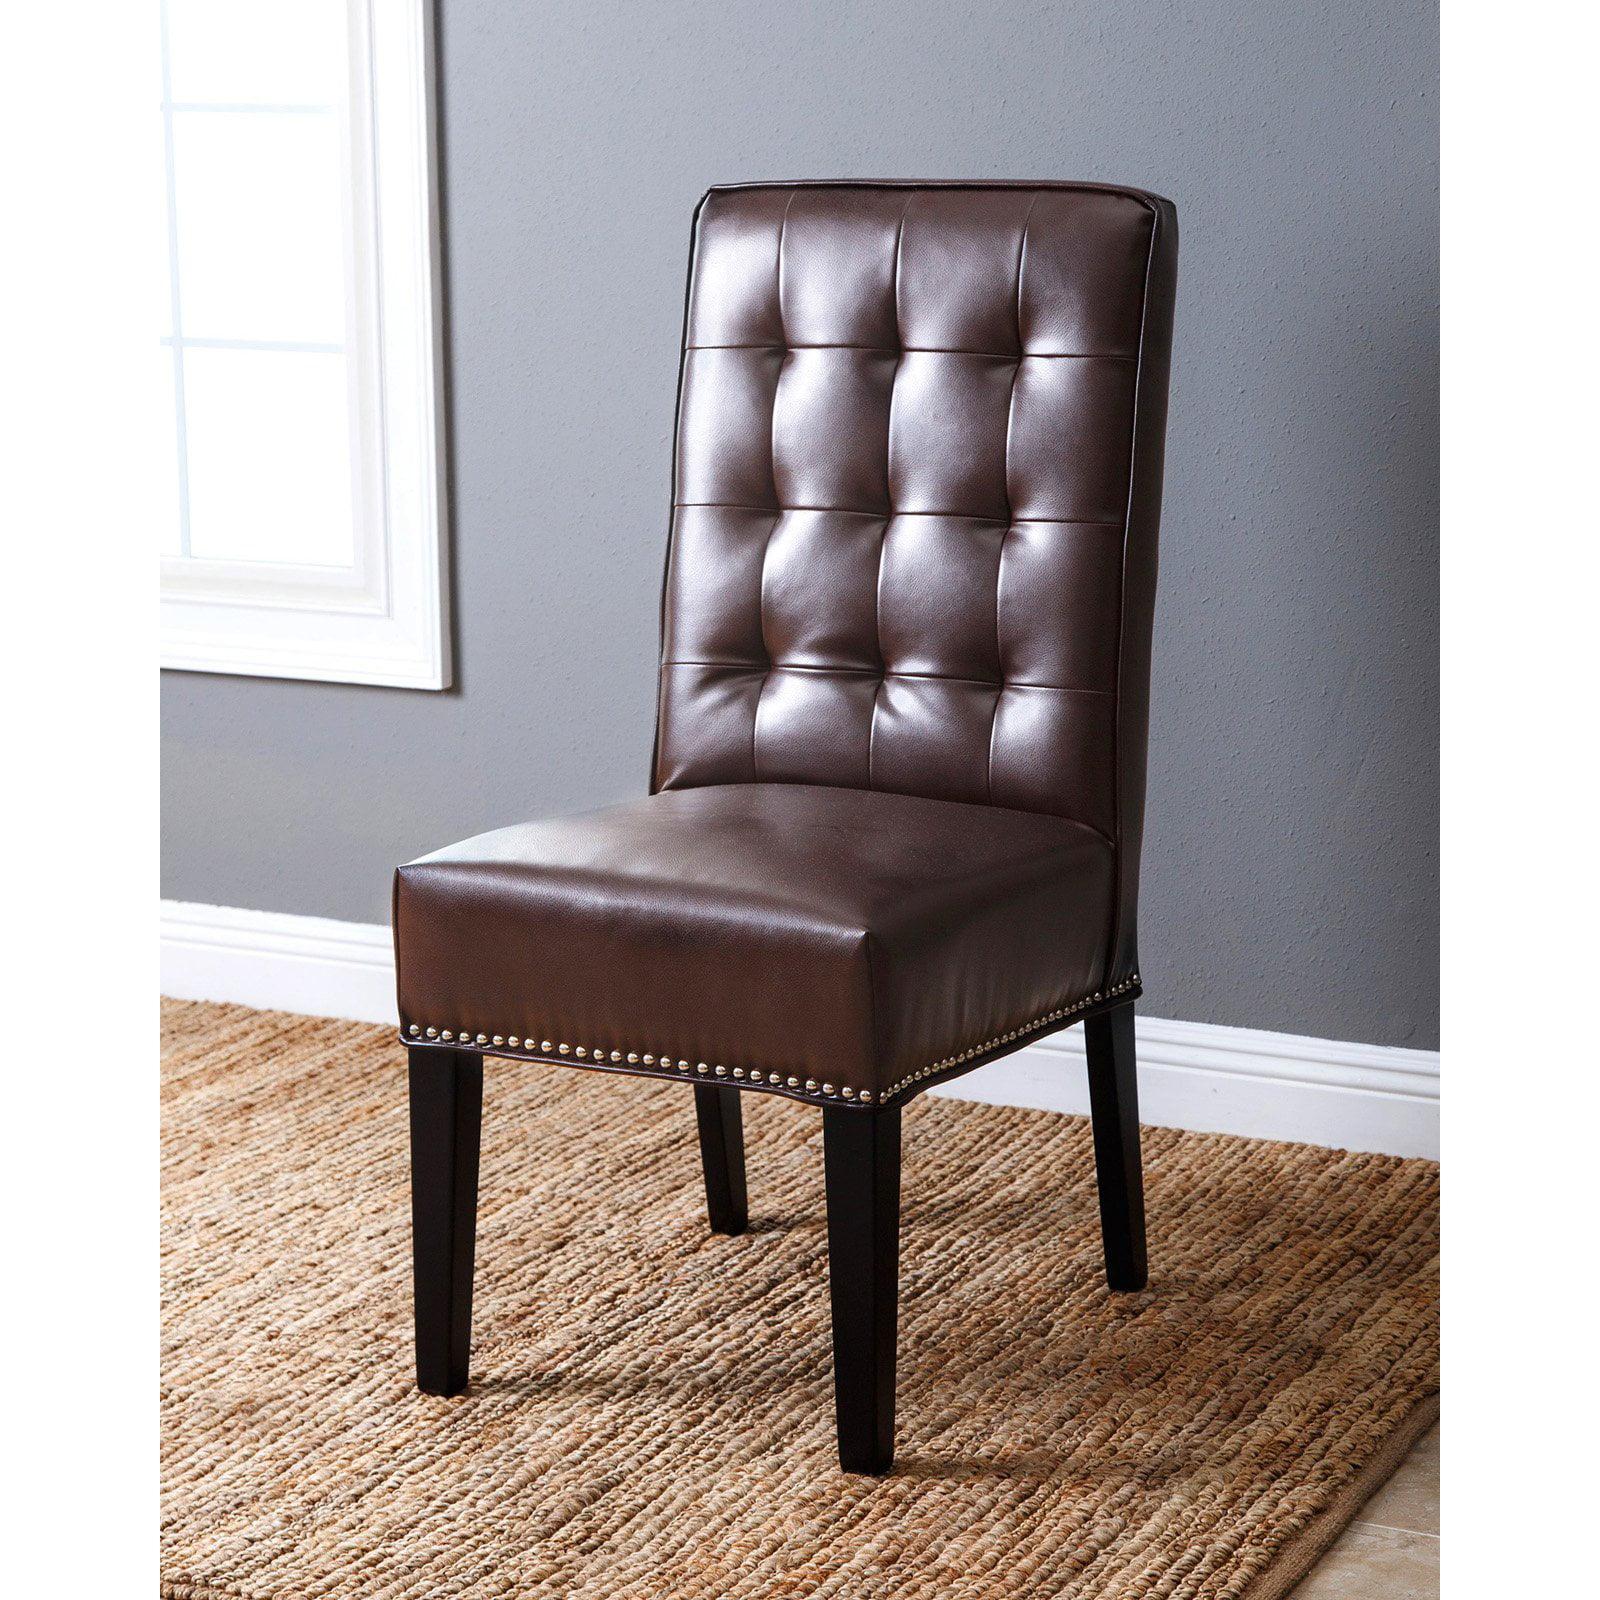 Pleasant Abbyson Fontana Leather And Nailhead Trim Side Dining Chair Ibusinesslaw Wood Chair Design Ideas Ibusinesslaworg